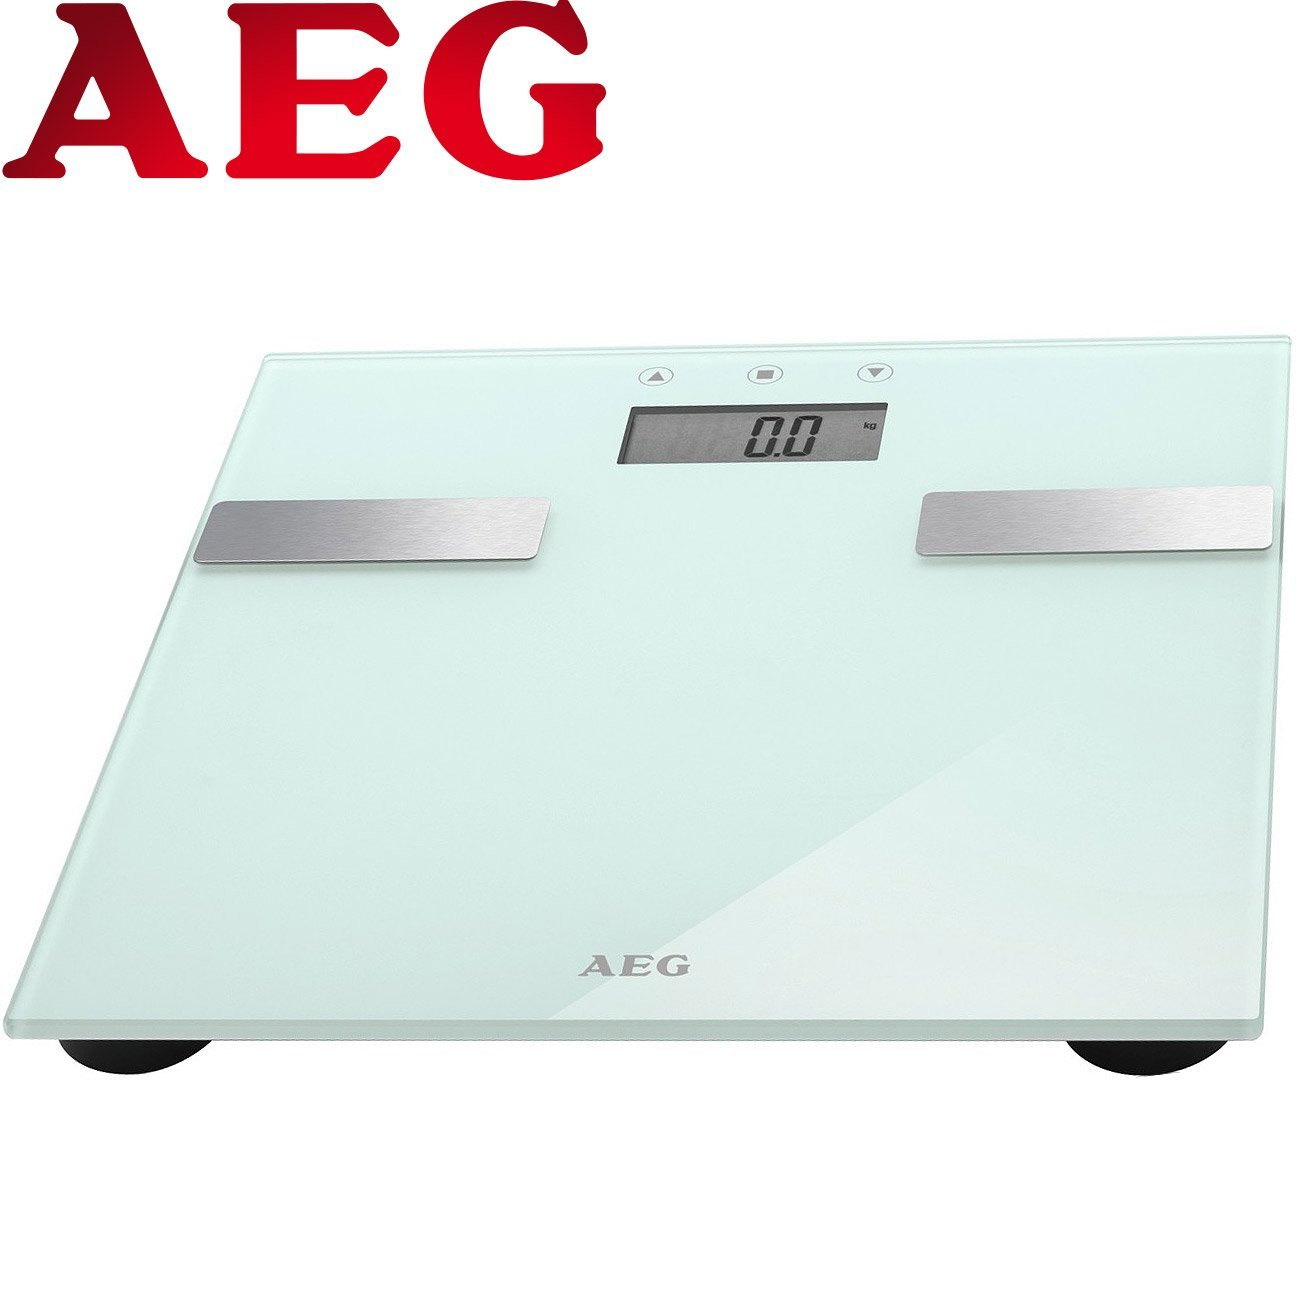 AEG PW 5644 Design 7 in1 Bilancia Pesapersone Bilancia Peso corporeo bilancia da bagno da Bilancia Bilancia digitale del grasso corporeo bilancia fino a 180 kg di analisi Bilancia in vetro